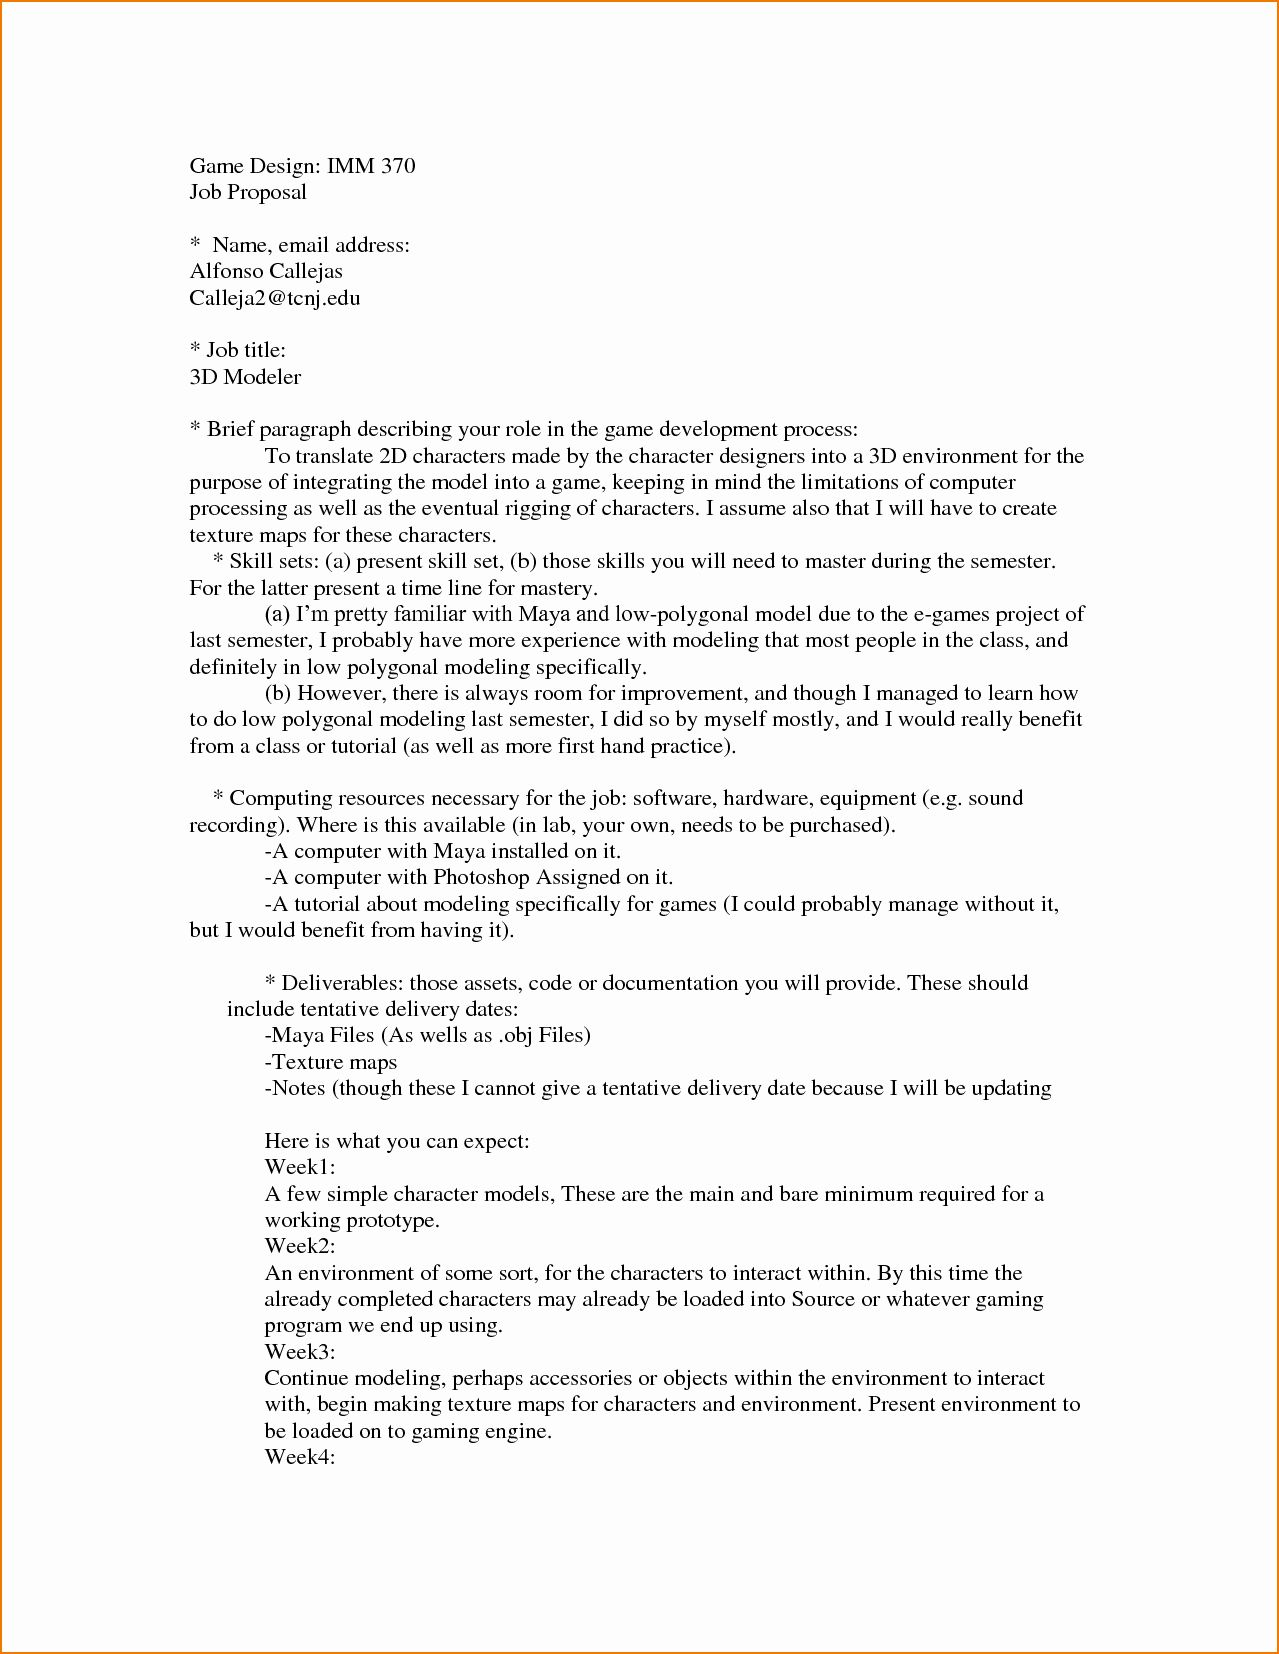 Template For Job Proposal Unique 4 Job Proposal Sample In 2020 Proposal Templates Business Proposal Template Free Proposal Template